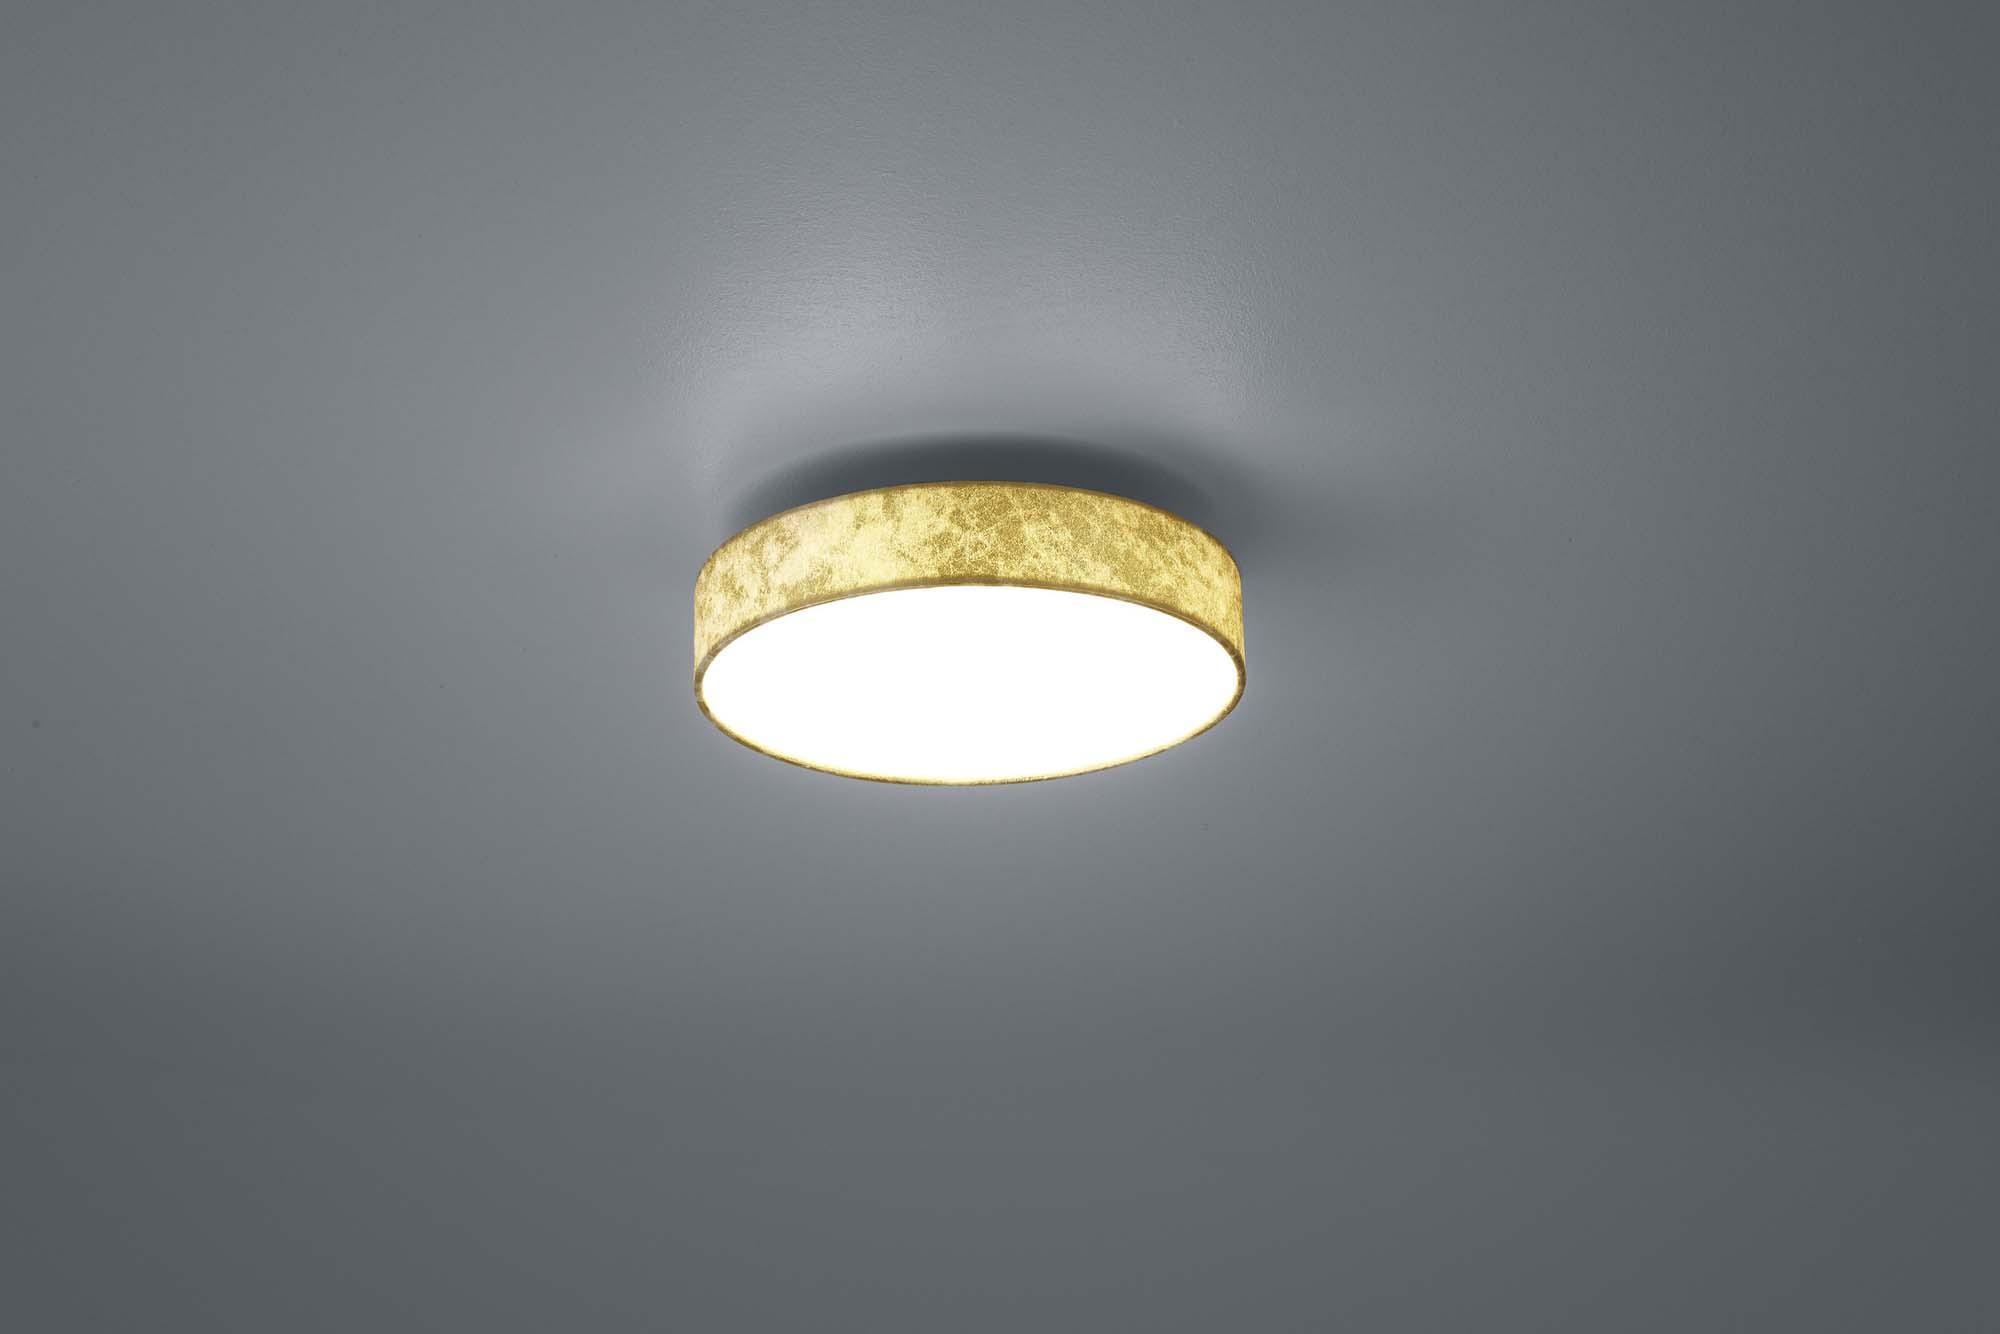 Plafoniere Moderne In Tessuto : Plafoniera moderna a led 11w in tessuto oro trio 621911279 lugano ebay